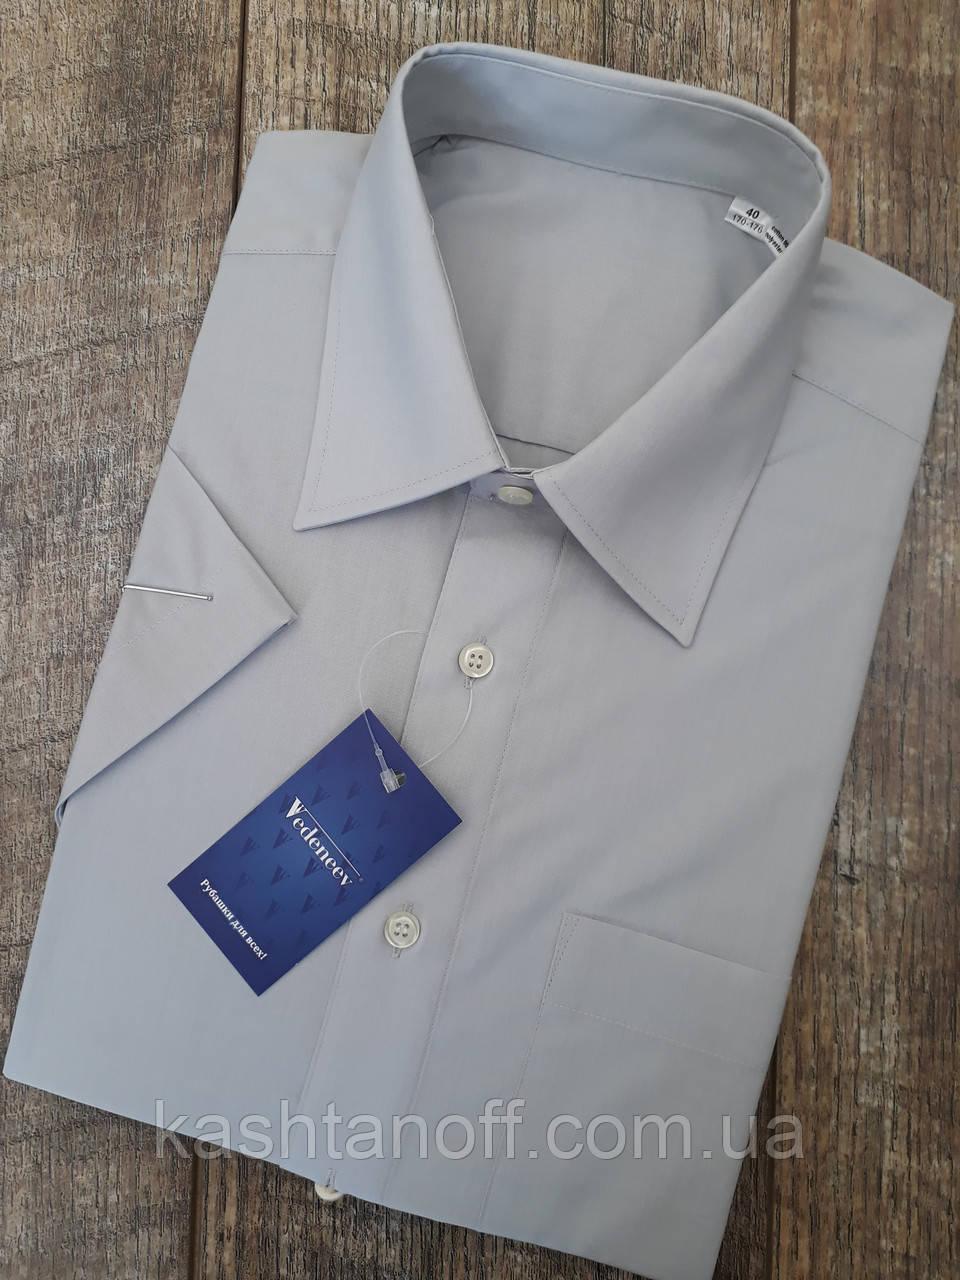 Мужская рубашка светло-серого цвета с коротким рукавом